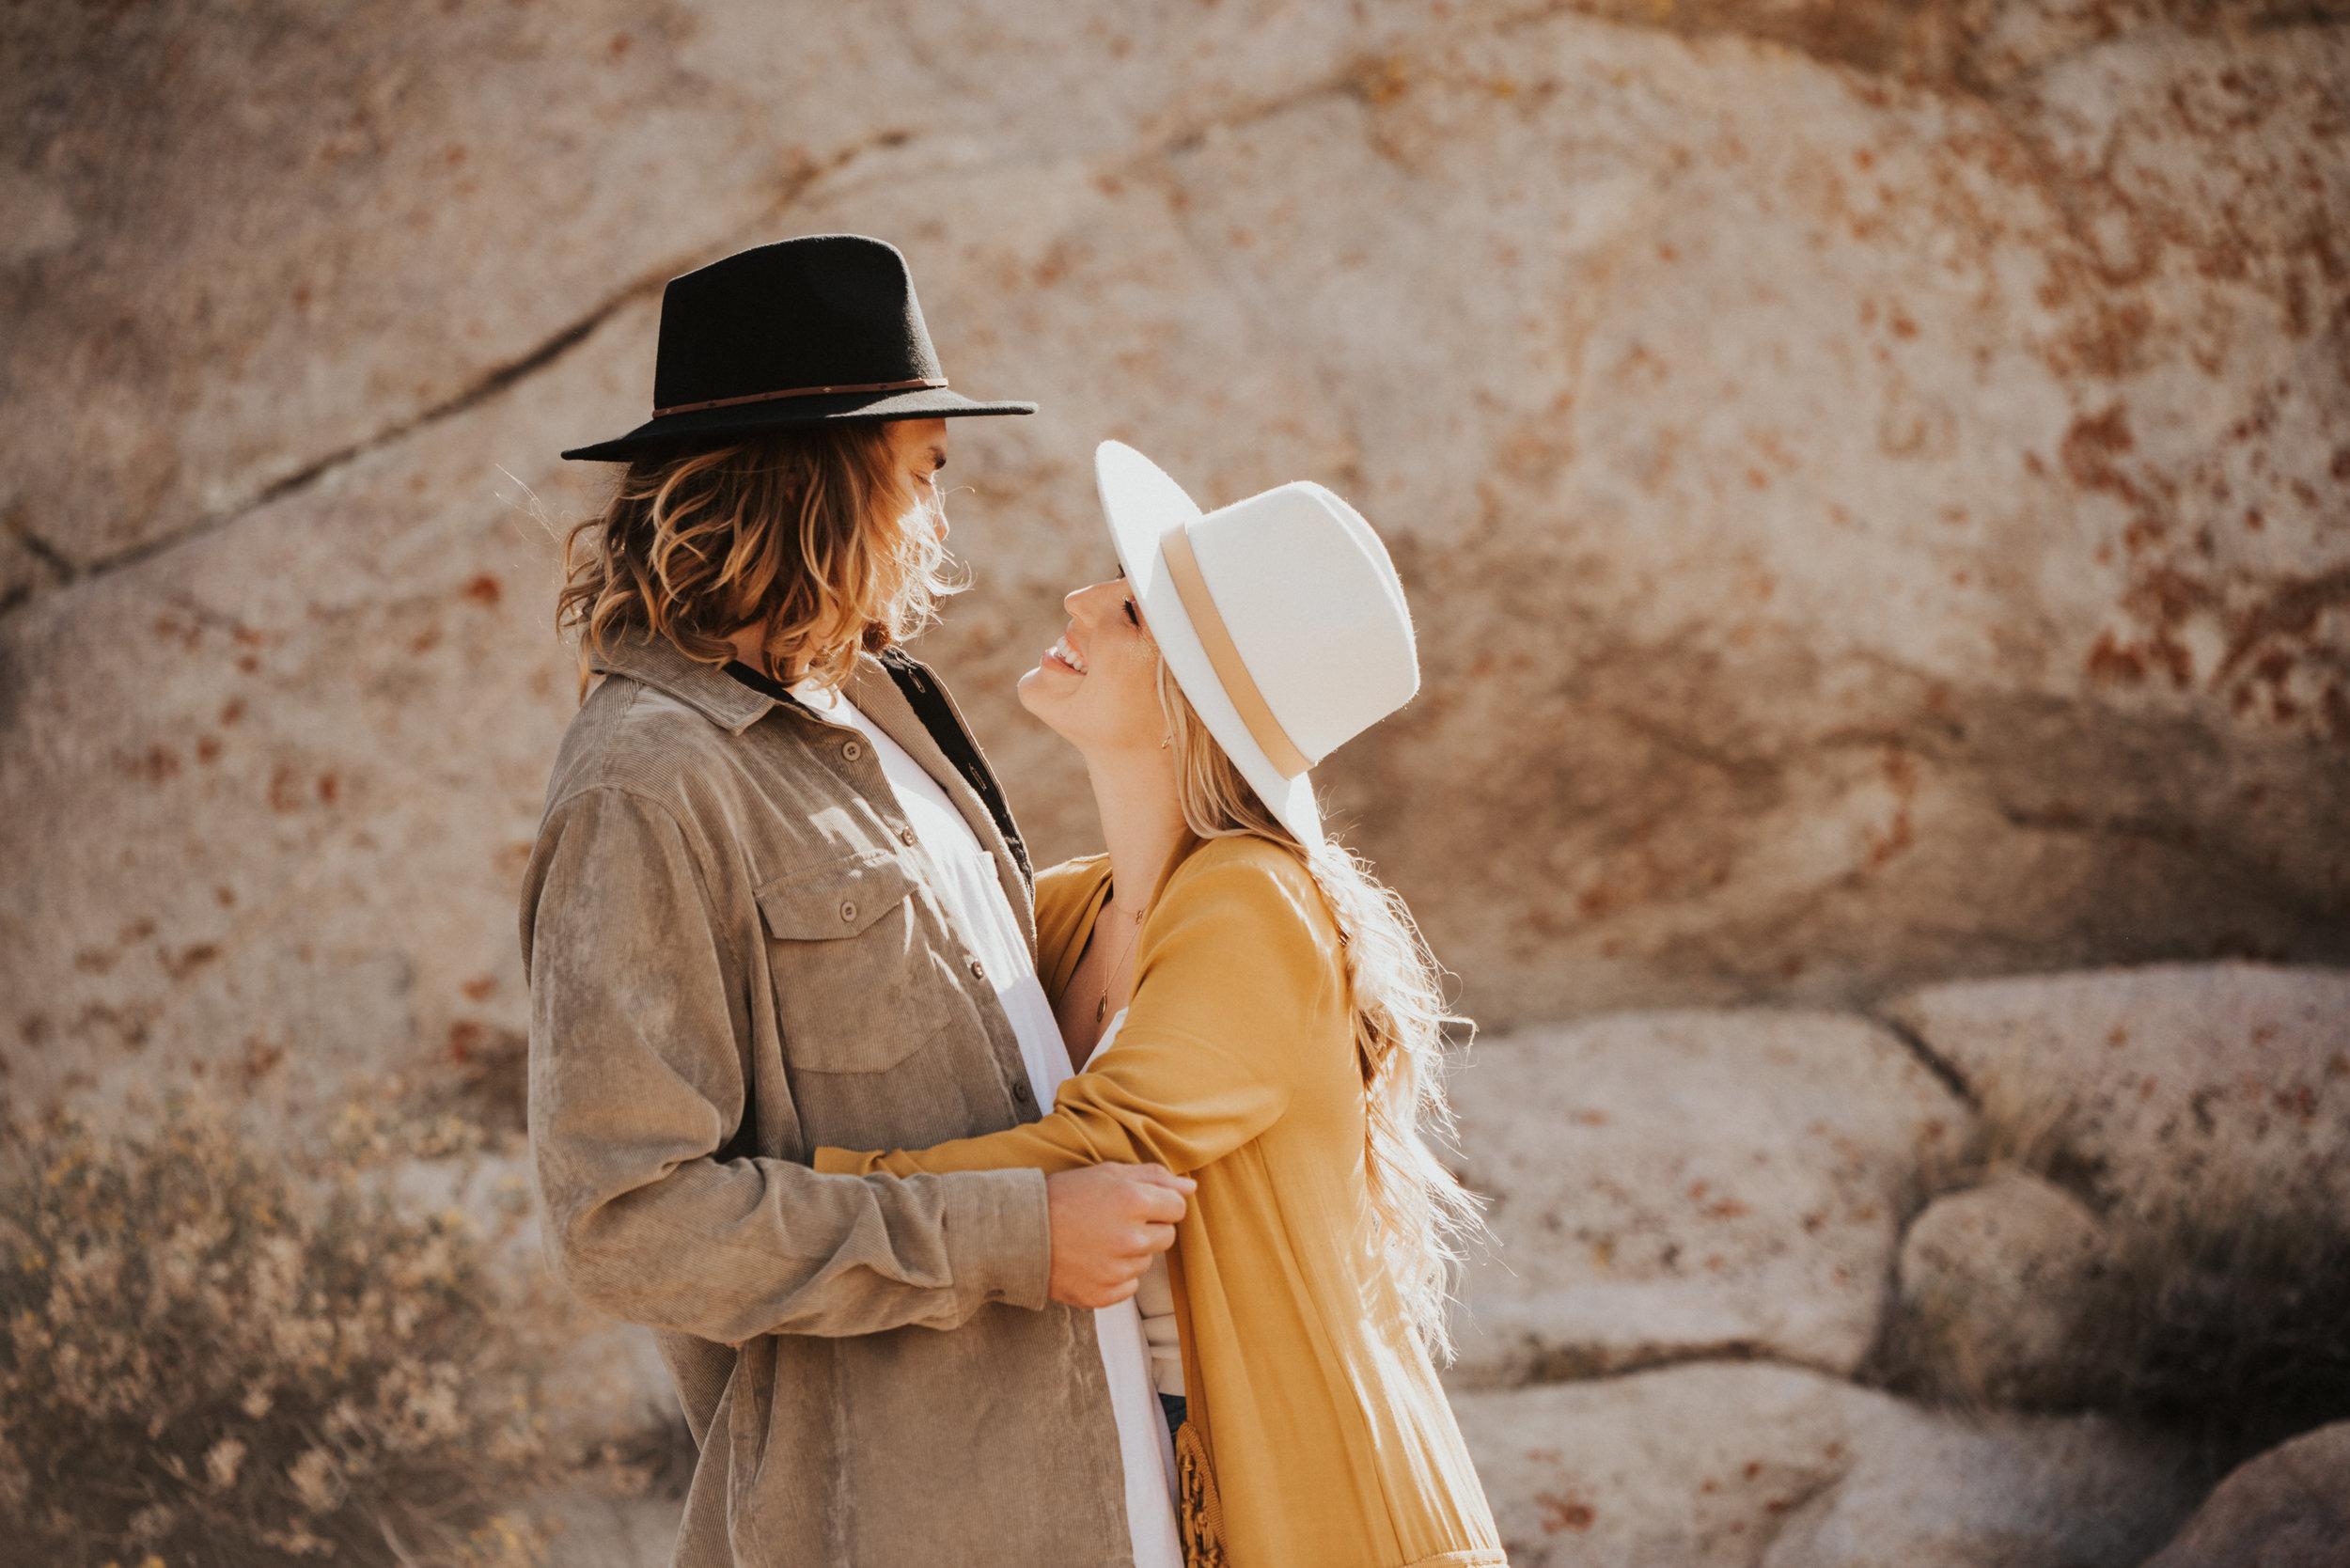 FortSt.John_photographer_TyraEPhotography_Wedding_Couple_Family_Photograhy_DawsonCreek_Elopement_Bride_Boduoir_Portraits-4509.jpg